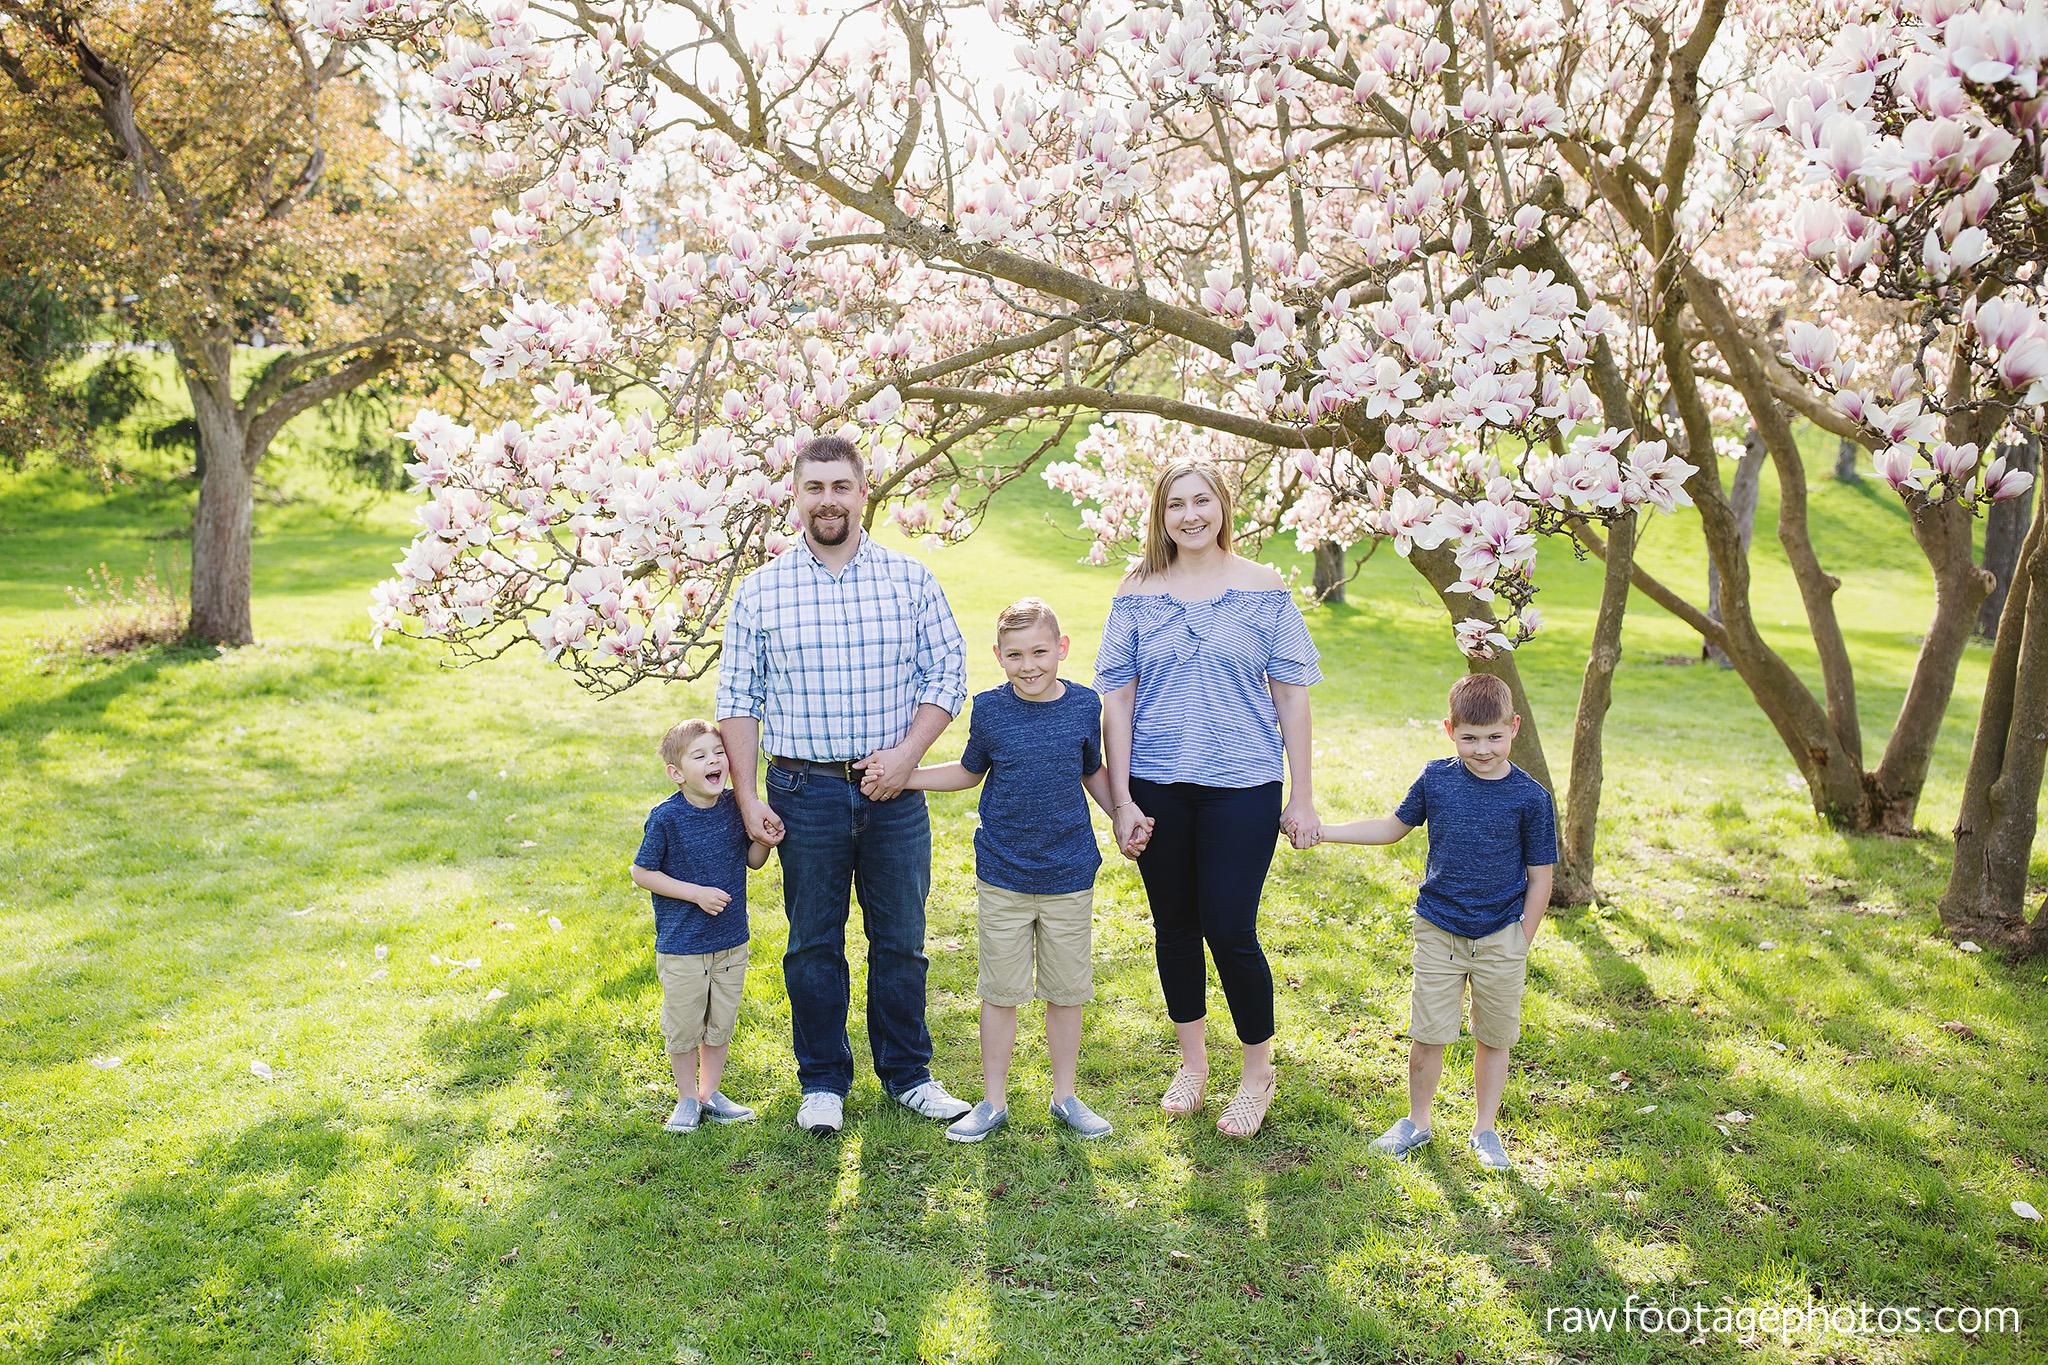 london_ontario_family_photographer-raw_footage_photography-spring_blossom_mini_sessions-magnolia-springbank_park016.jpg